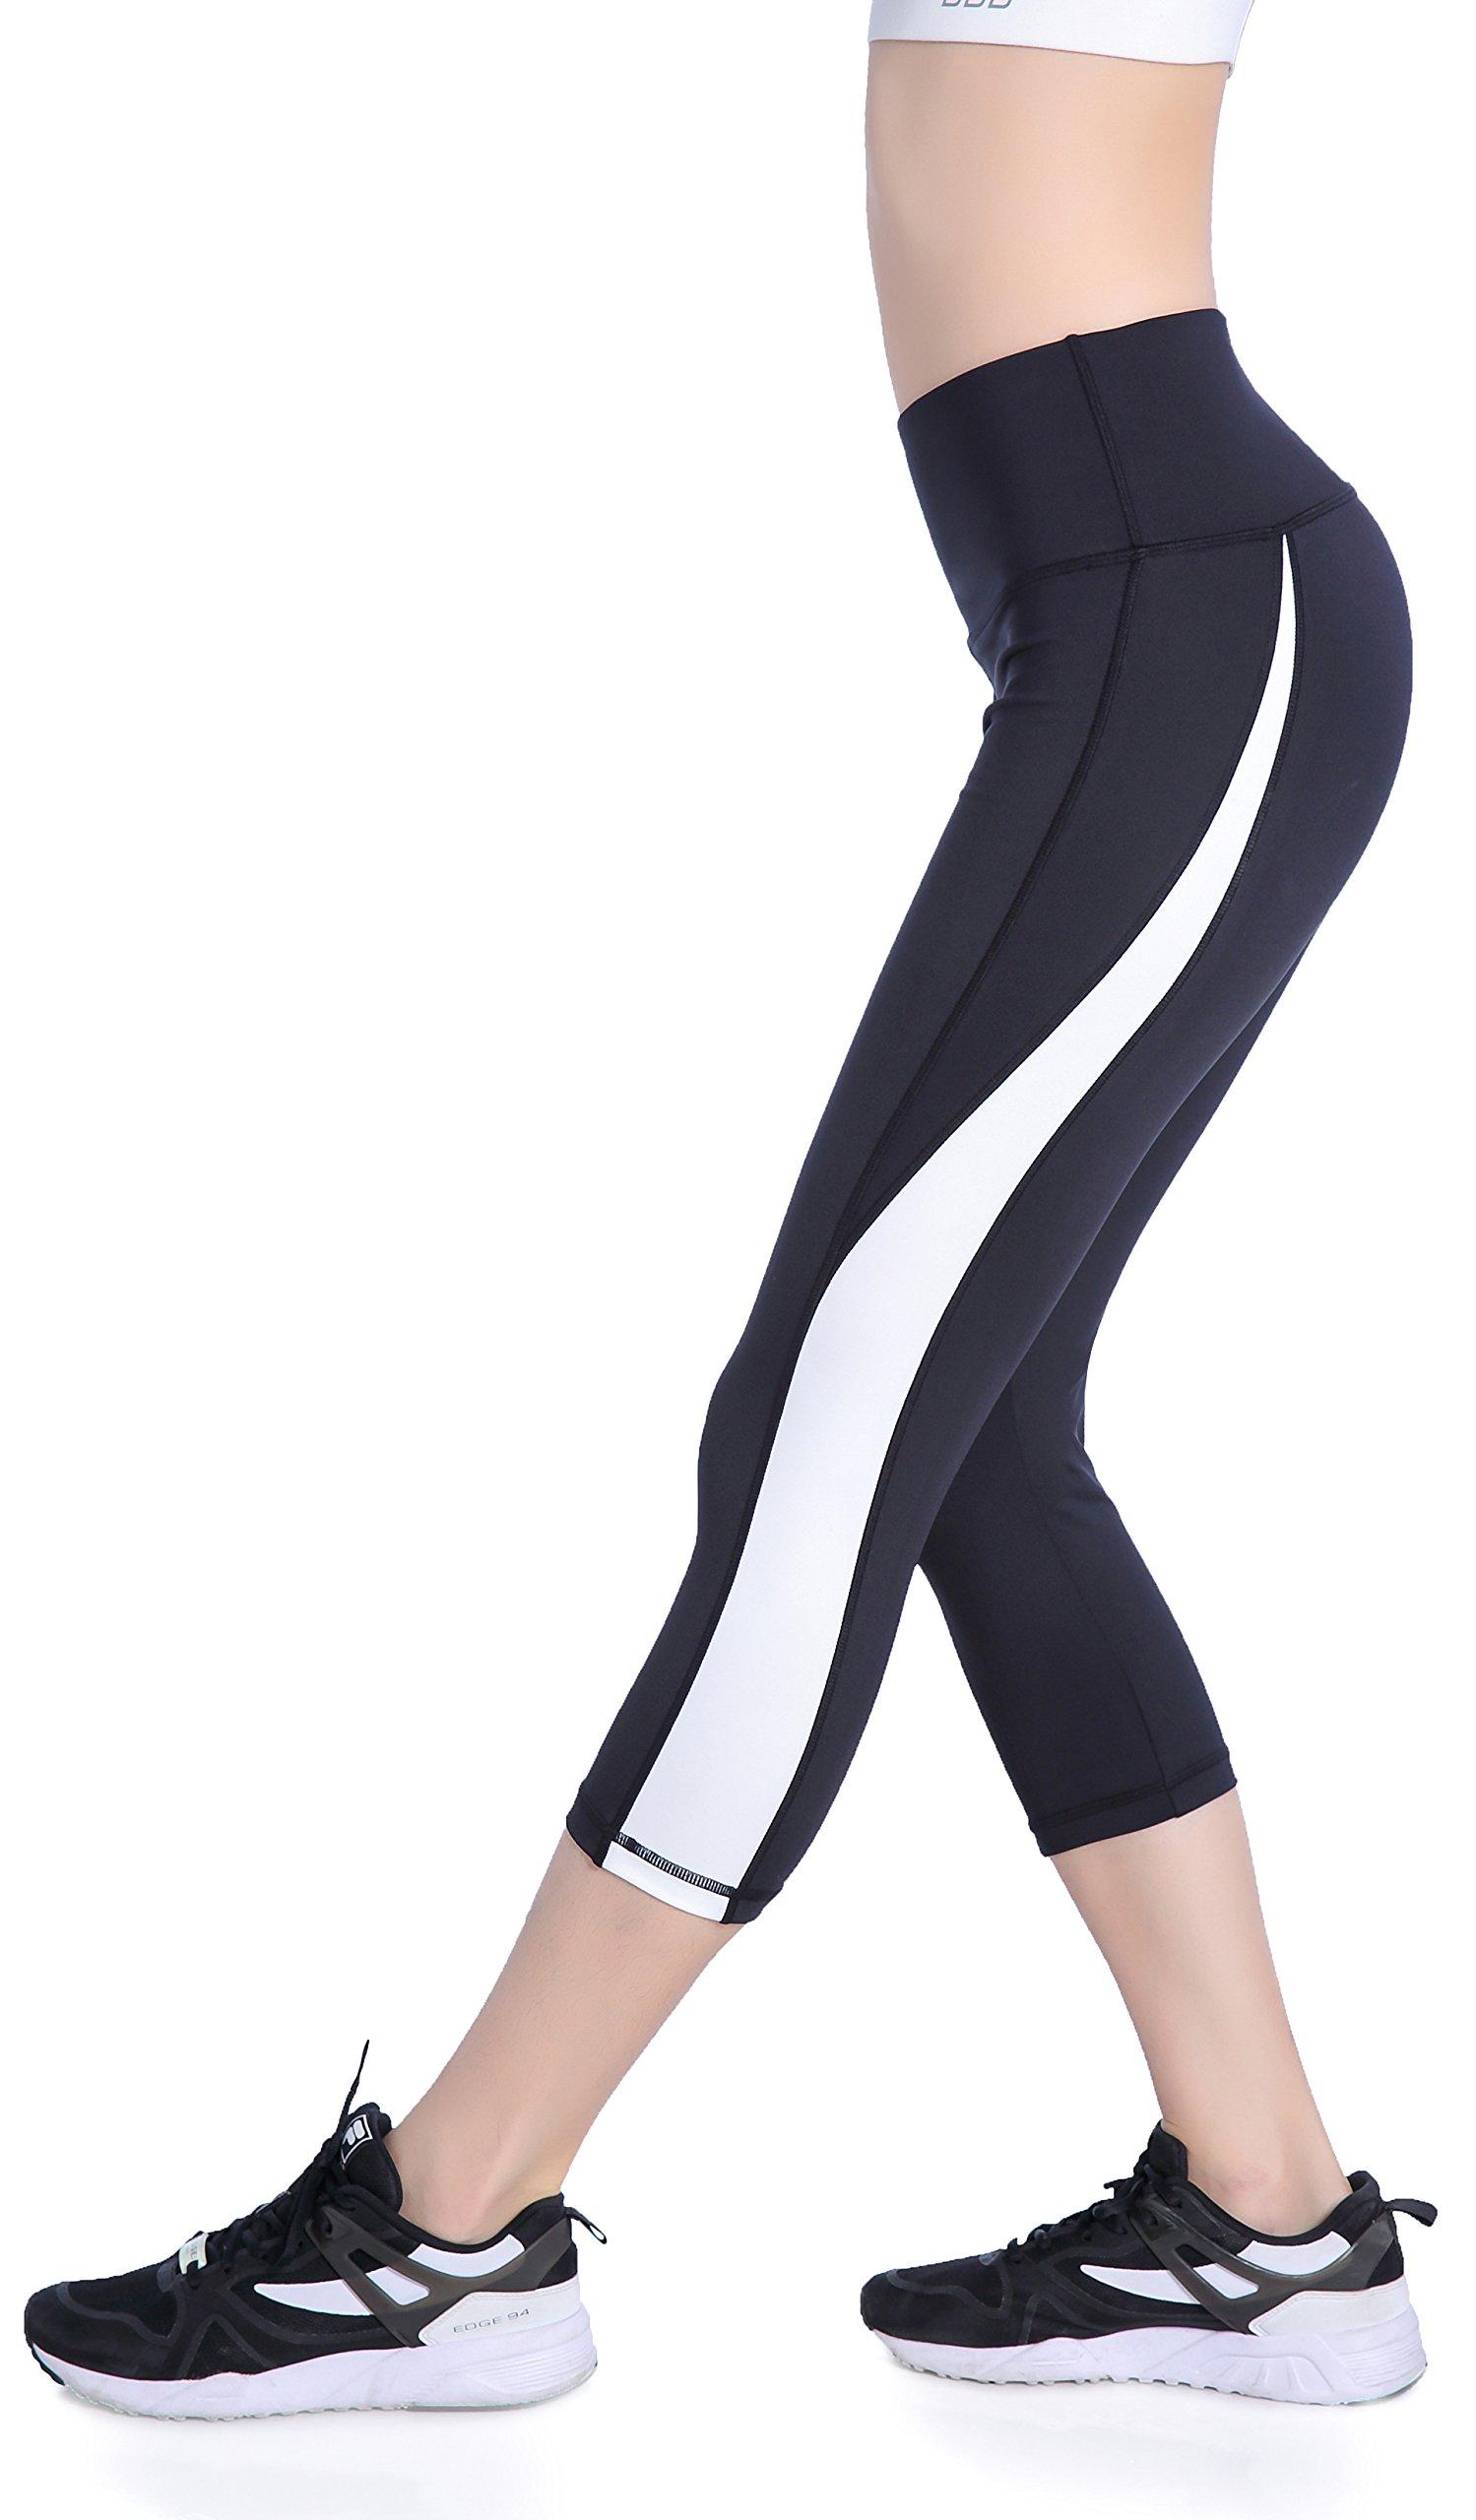 Picotee Women's Yoga Pants Workout Capri Leggings Running Tights w Side Pocket (XL, Black/White)